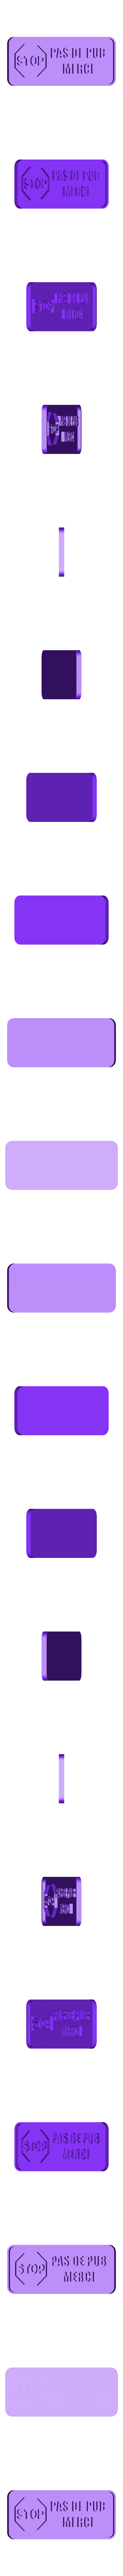 paspub.obj Download free OBJ file Stop ads in the mailbox • 3D printer design, Gogorian